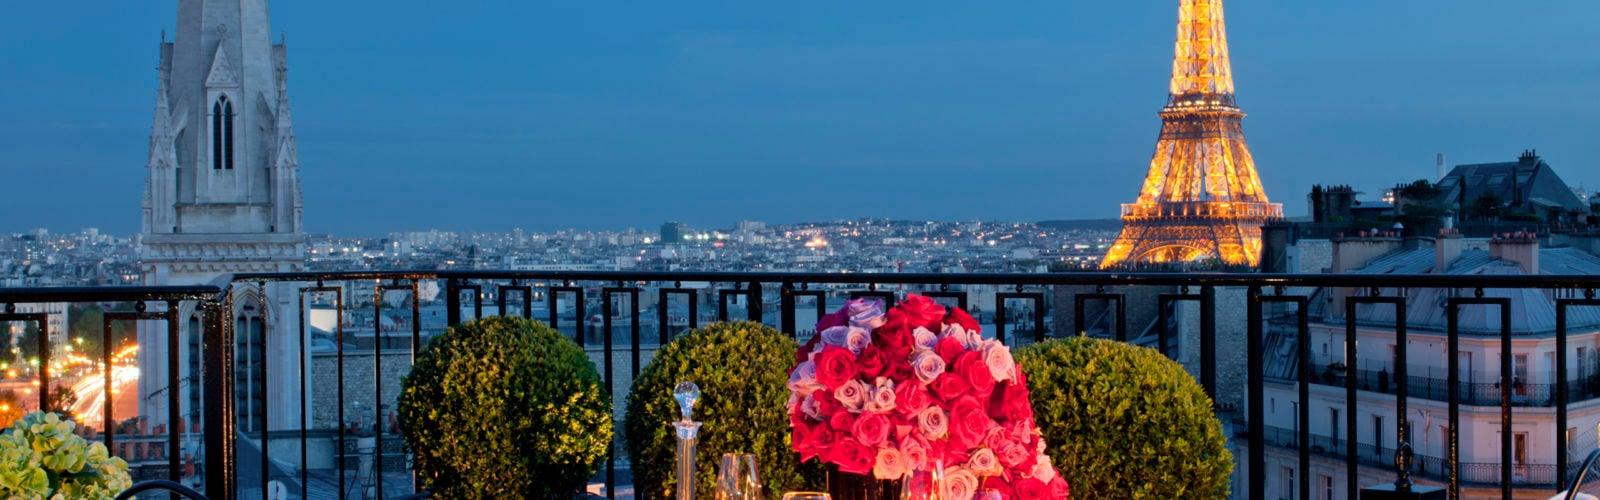 four-seasons-paris-view